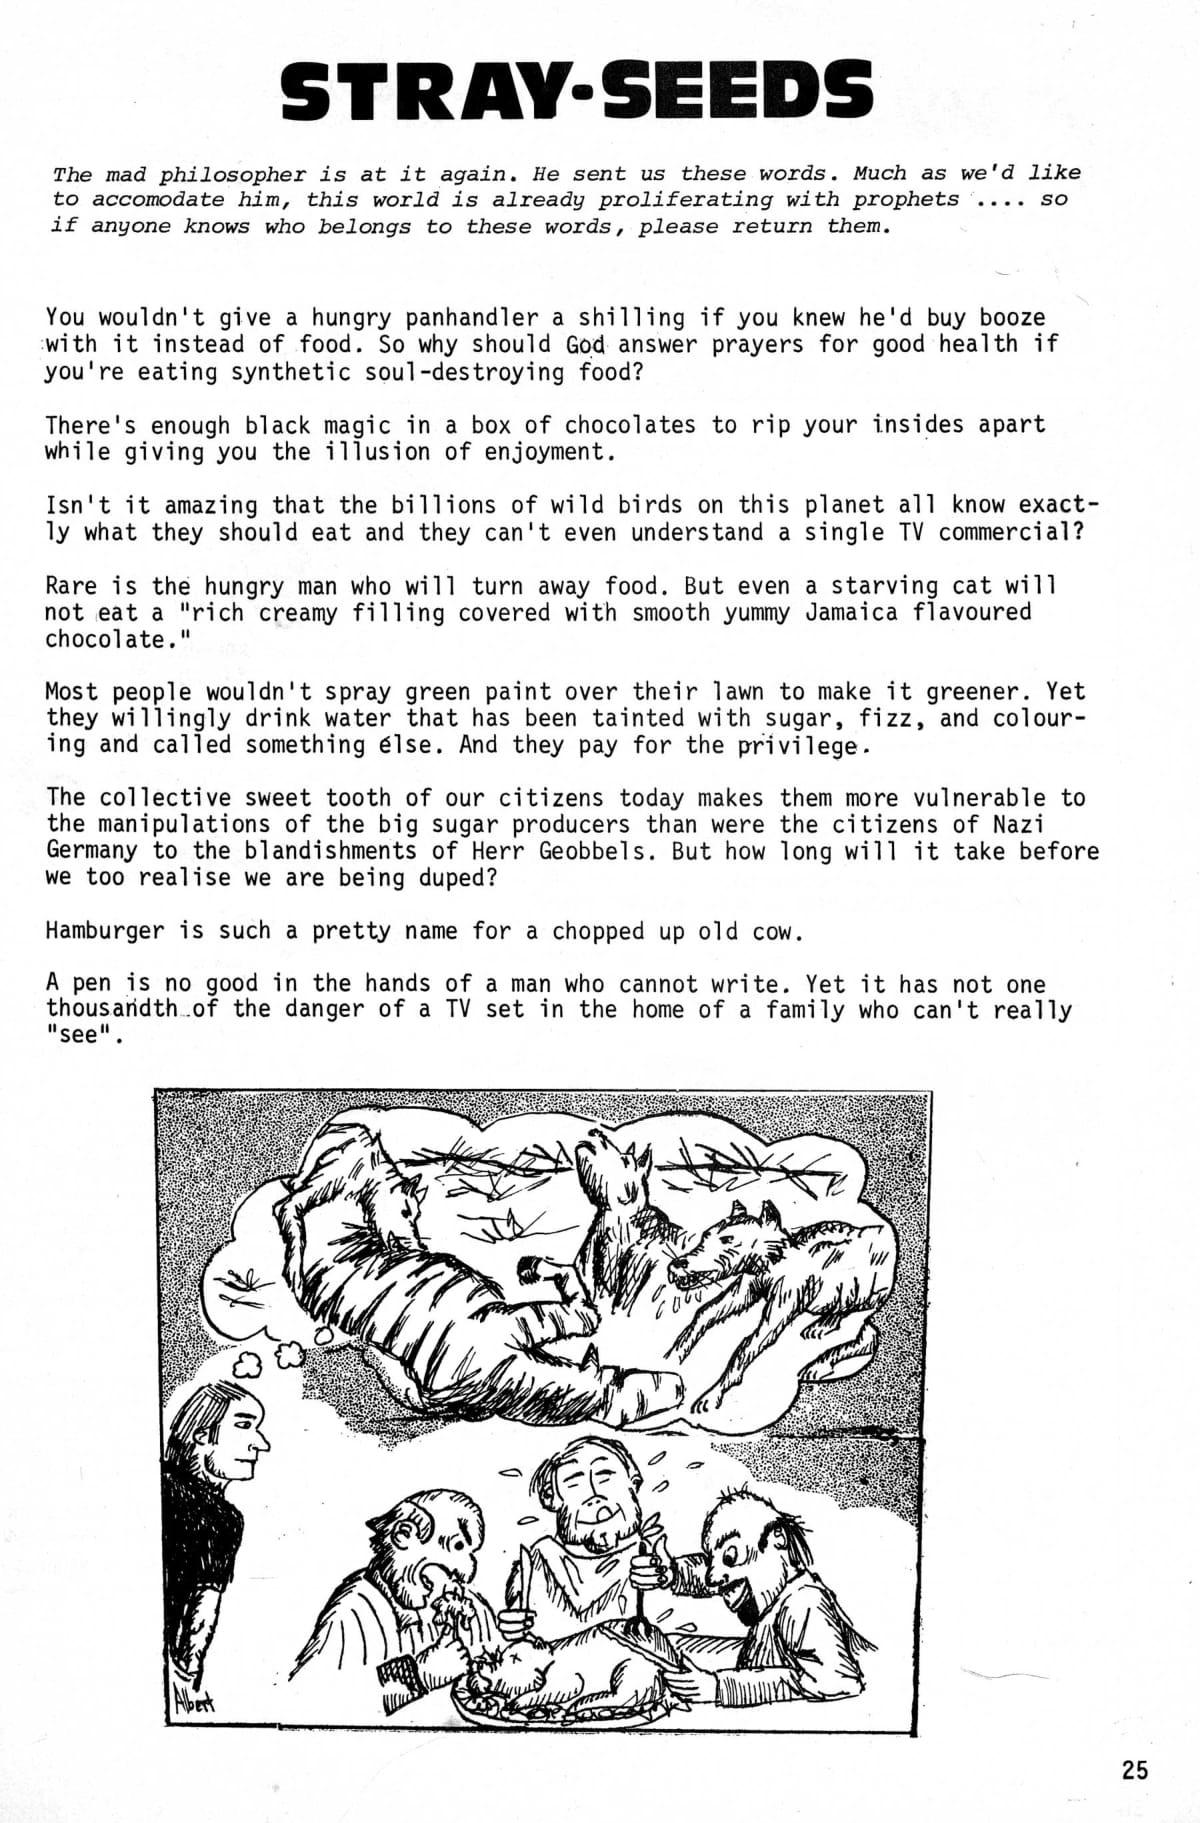 seed-v2-n6-june1973-25.jpg